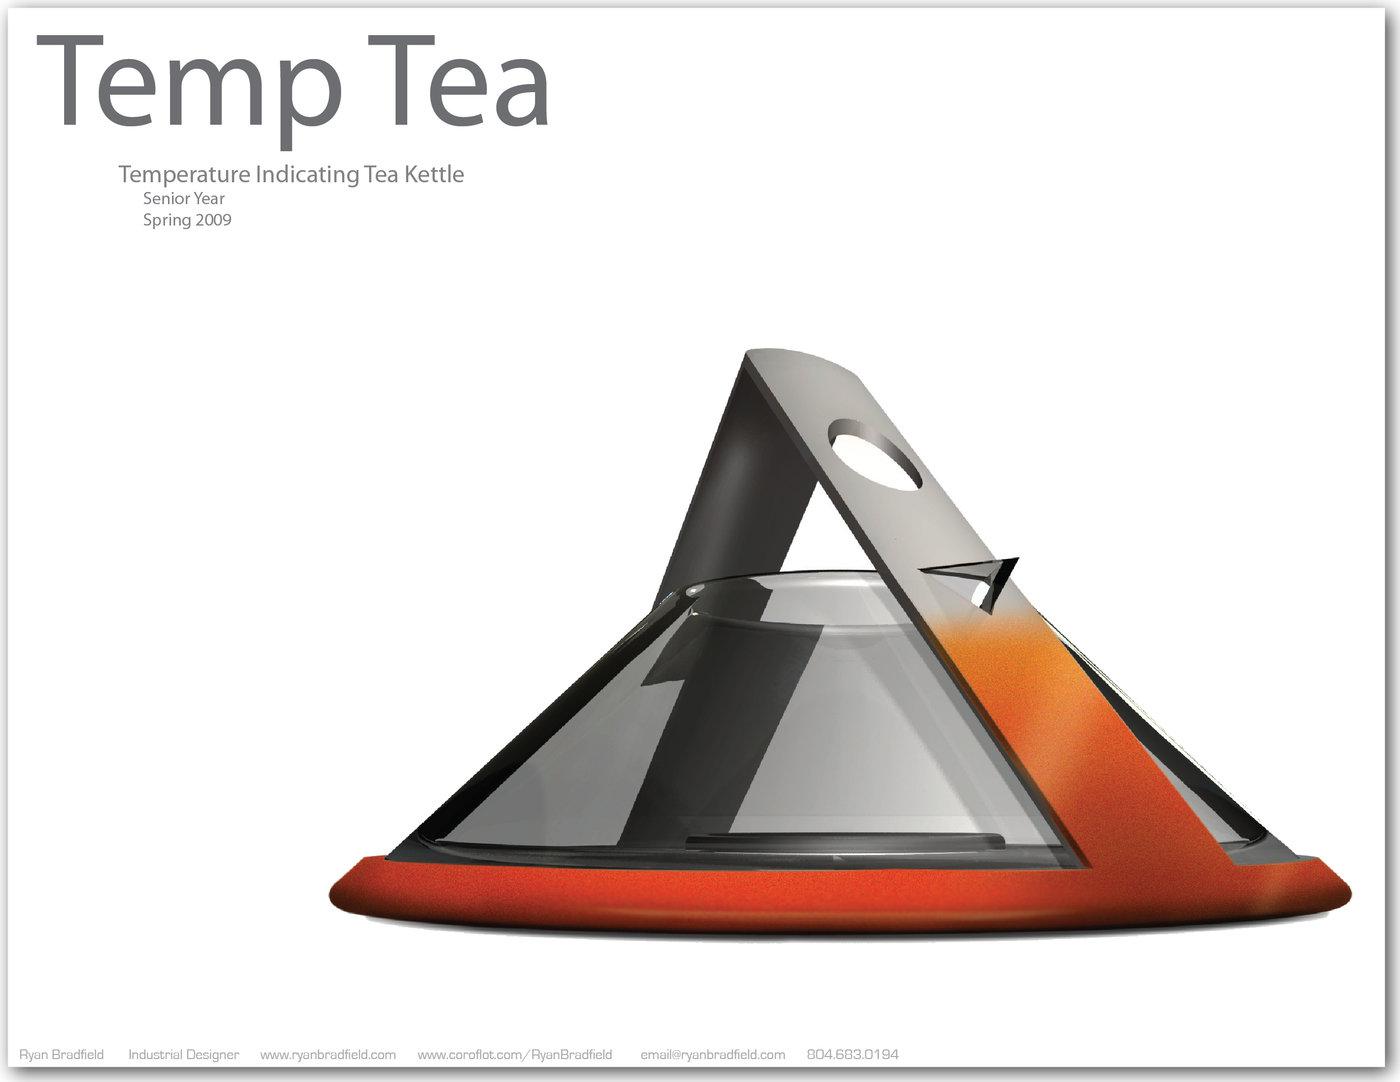 Temp Tea by Ryan Bradfield at Coroflot com